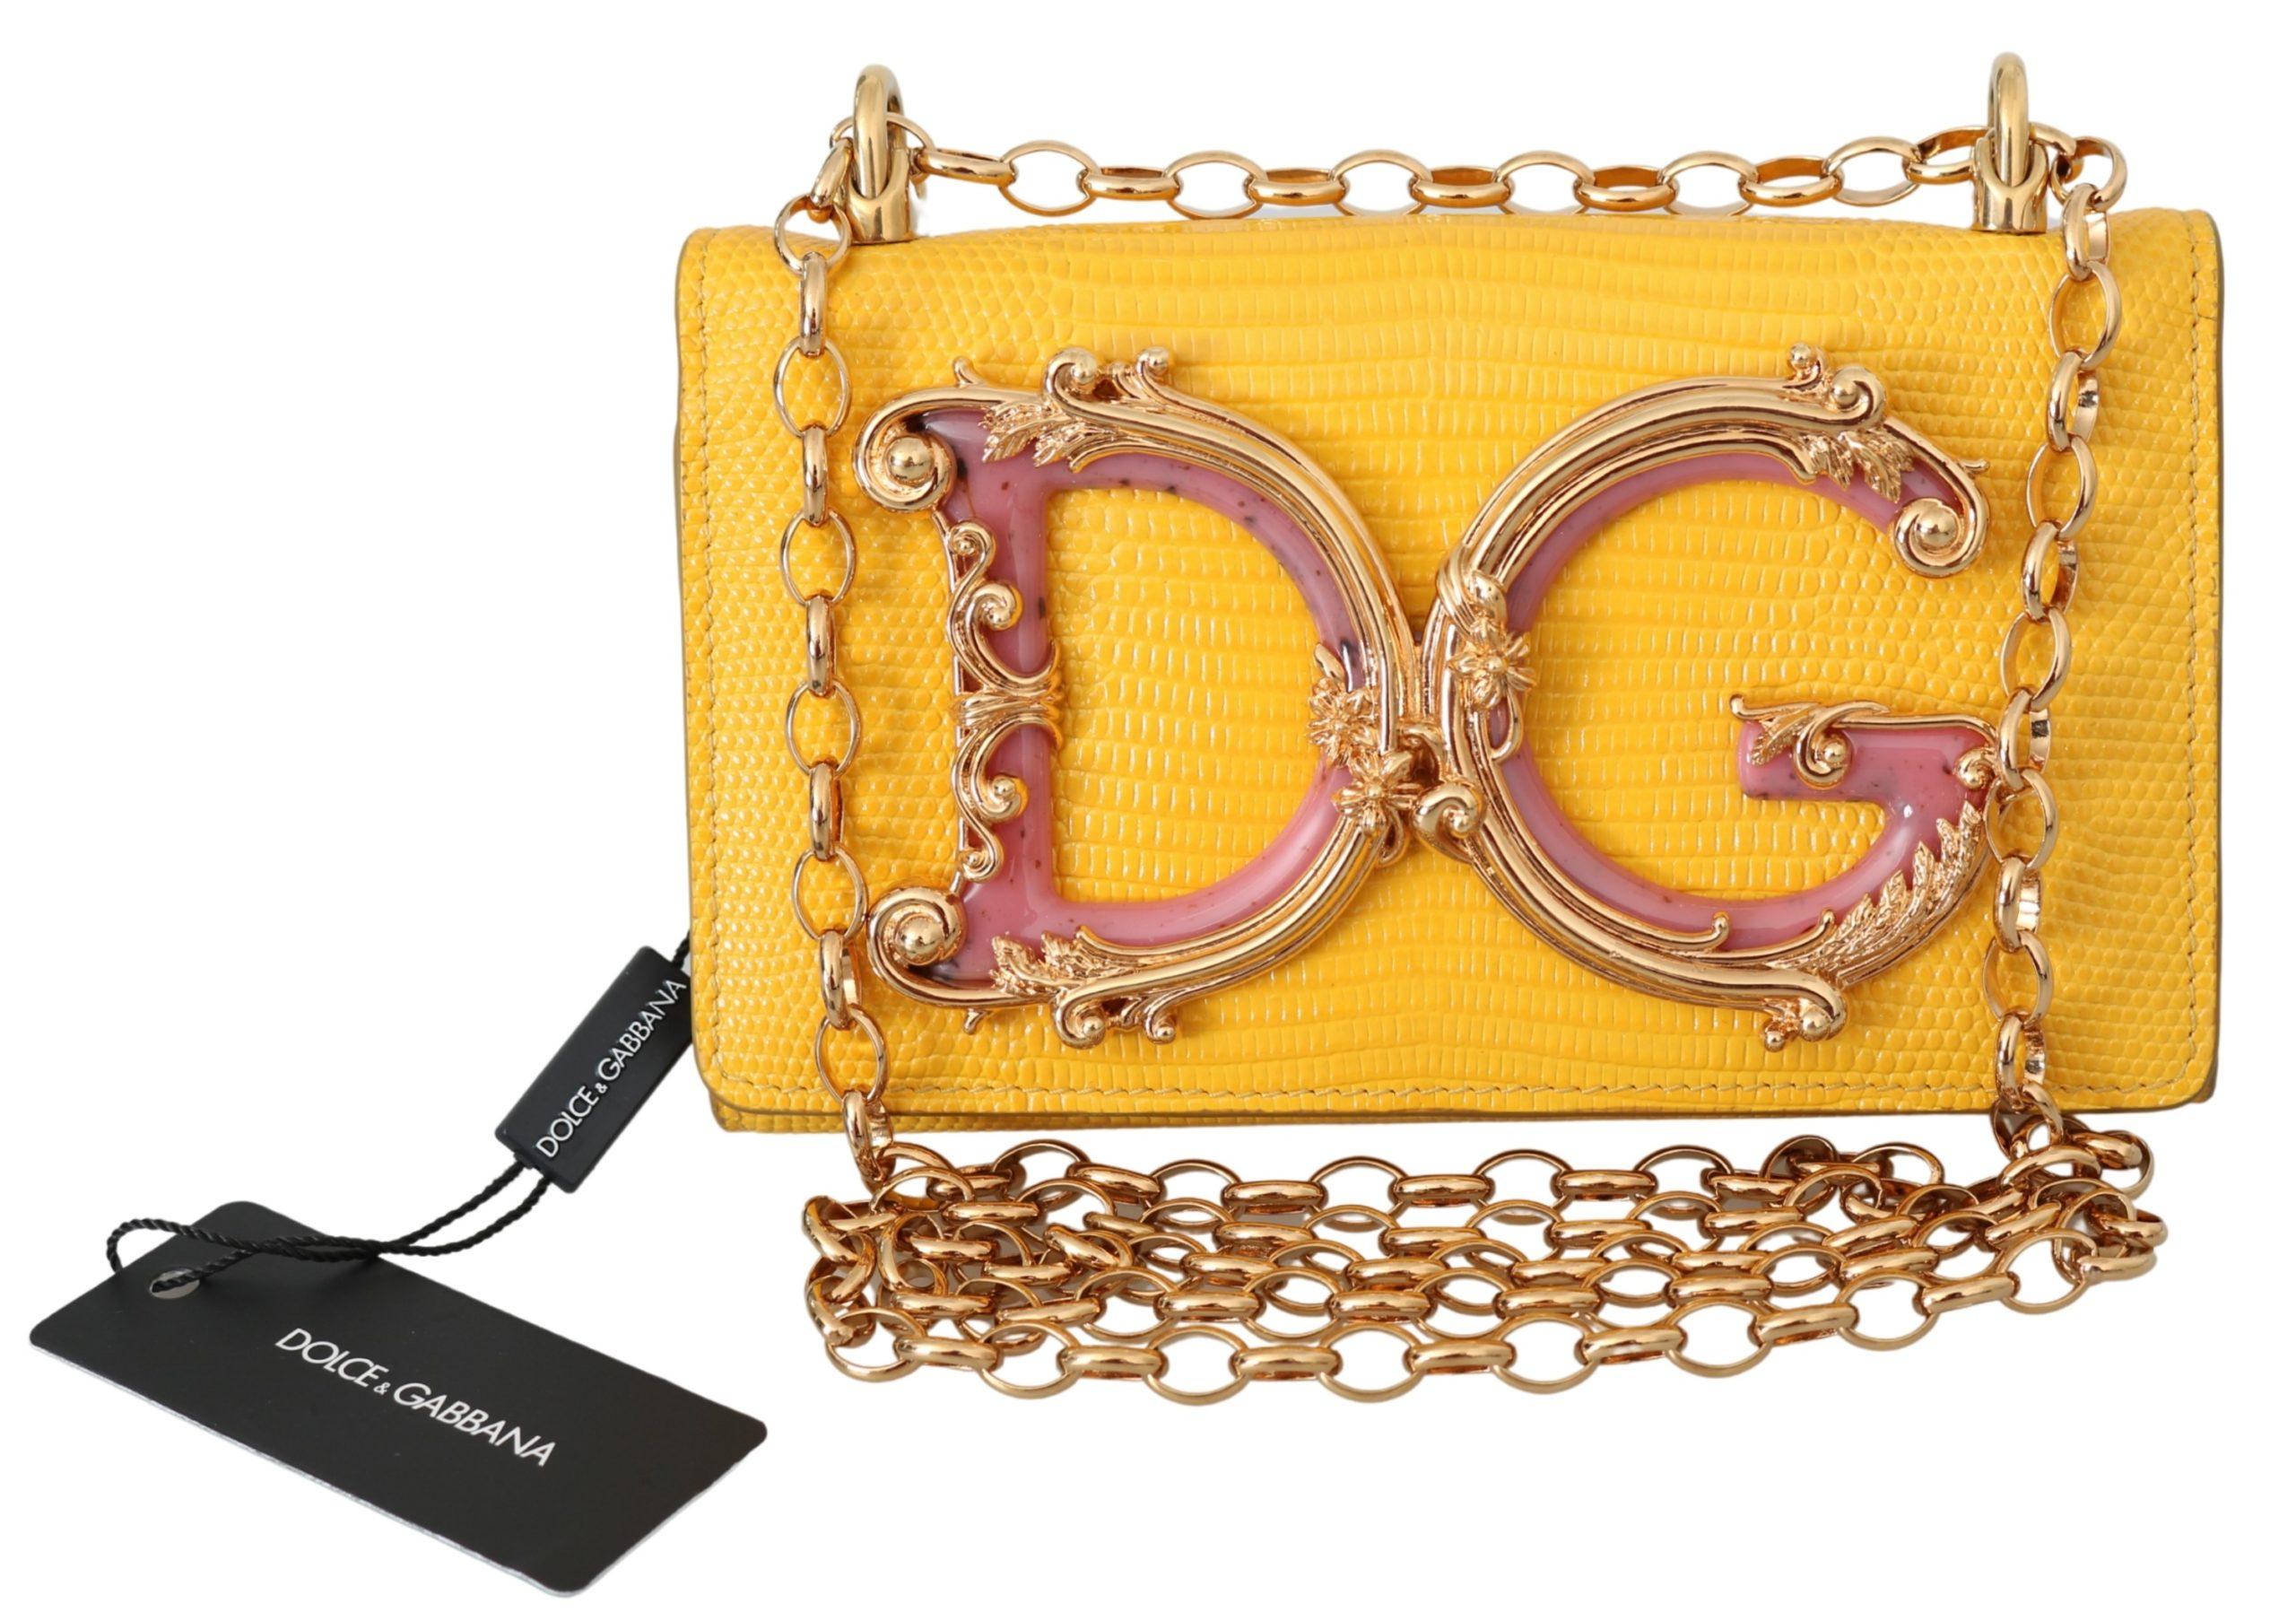 Dolce & Gabbana Women's Leather Logo iPhone X Cover Crossbody Bag Yellow VAS9915